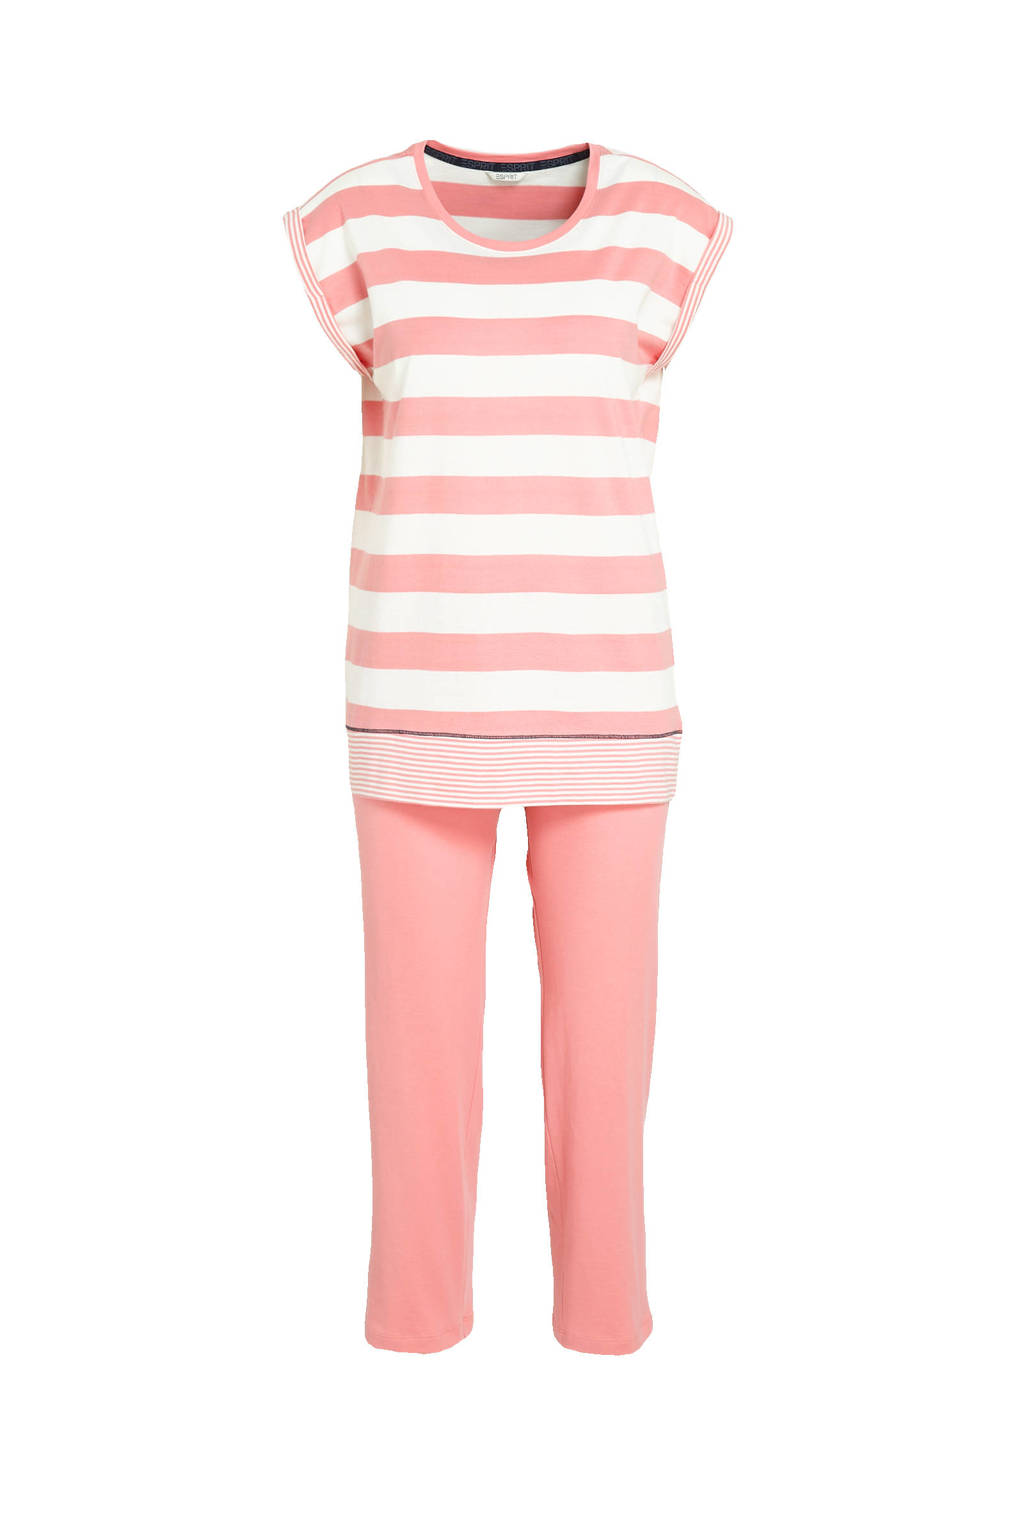 ESPRIT Women Bodywear pyjama met strepen koraalrood/wit, Koraalrood/wit